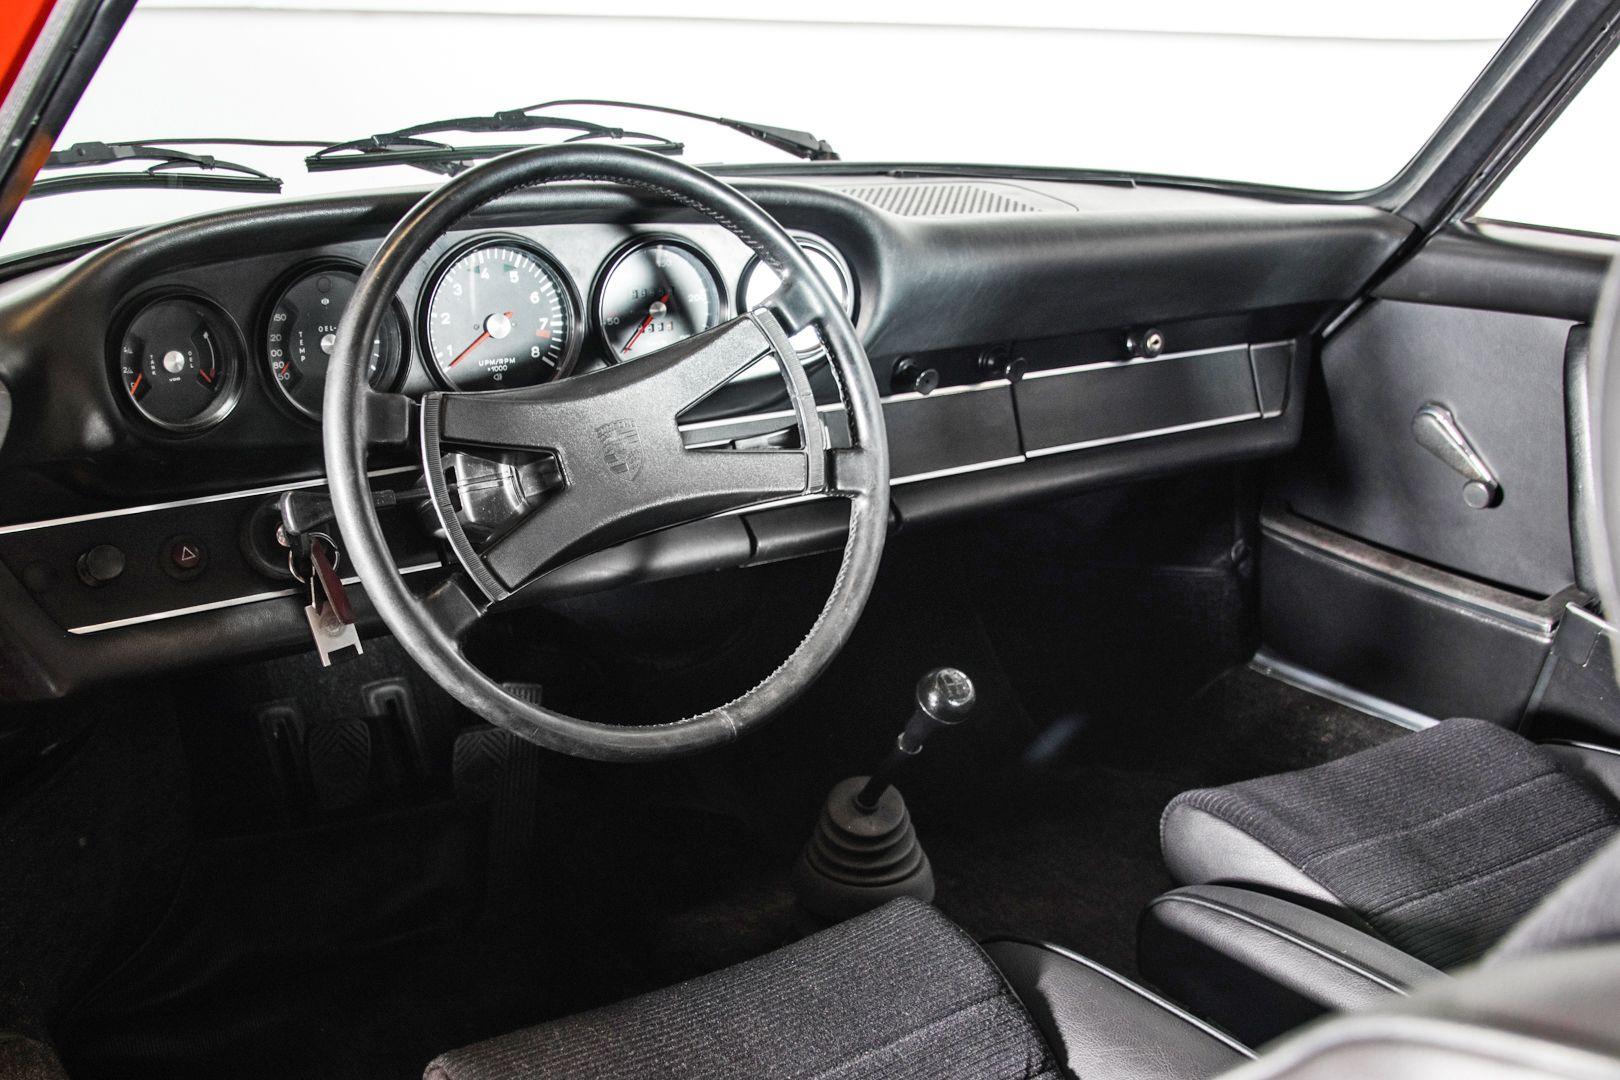 1973 Porsche 911 Carrera 2.7 RS 44403